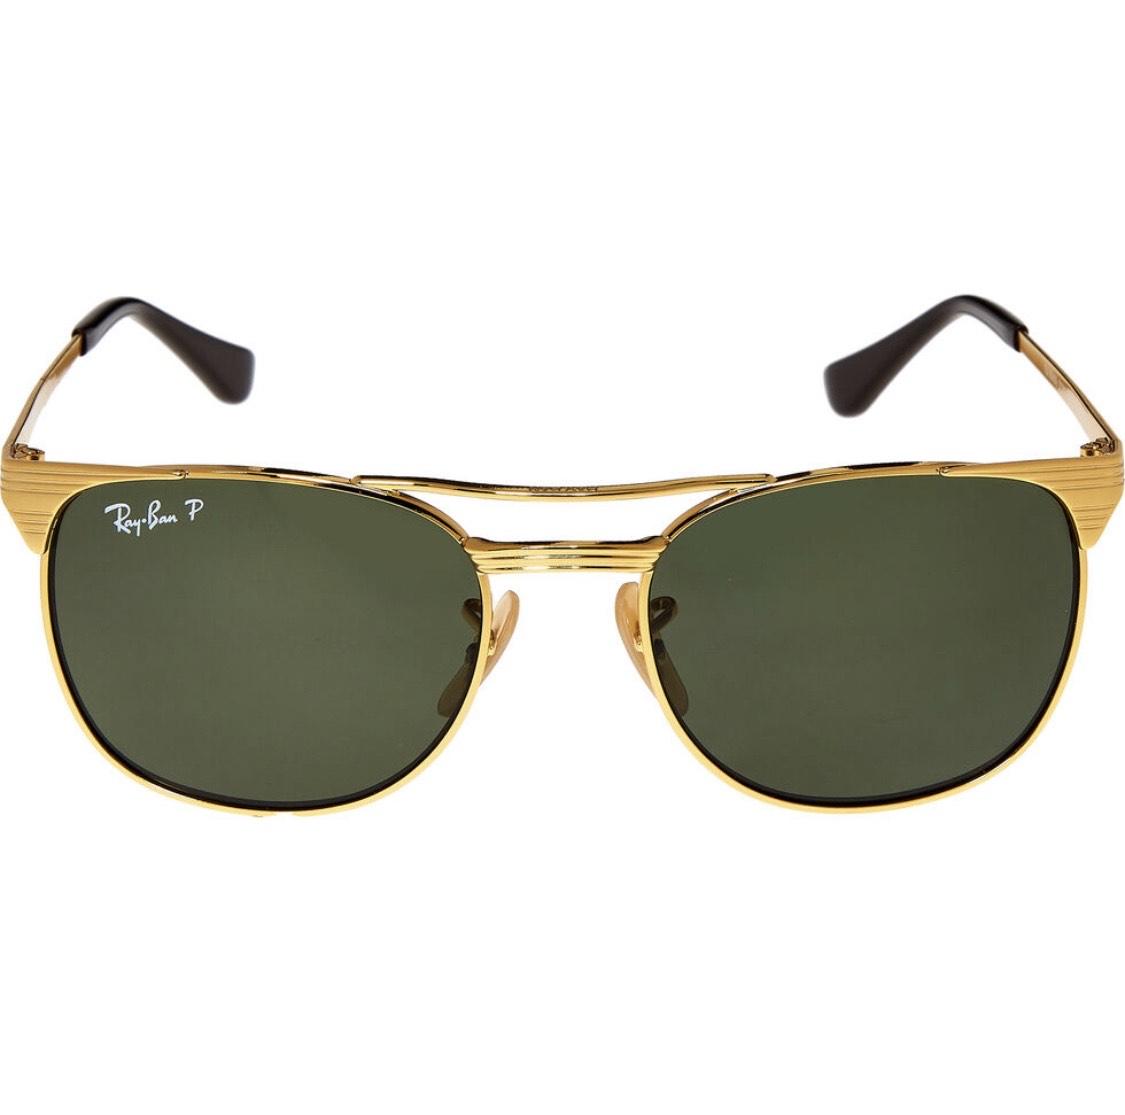 Ray Ban Kids Gold Tone Sunglasses - £39.99 / £43.98 delivered @ TK Maxx